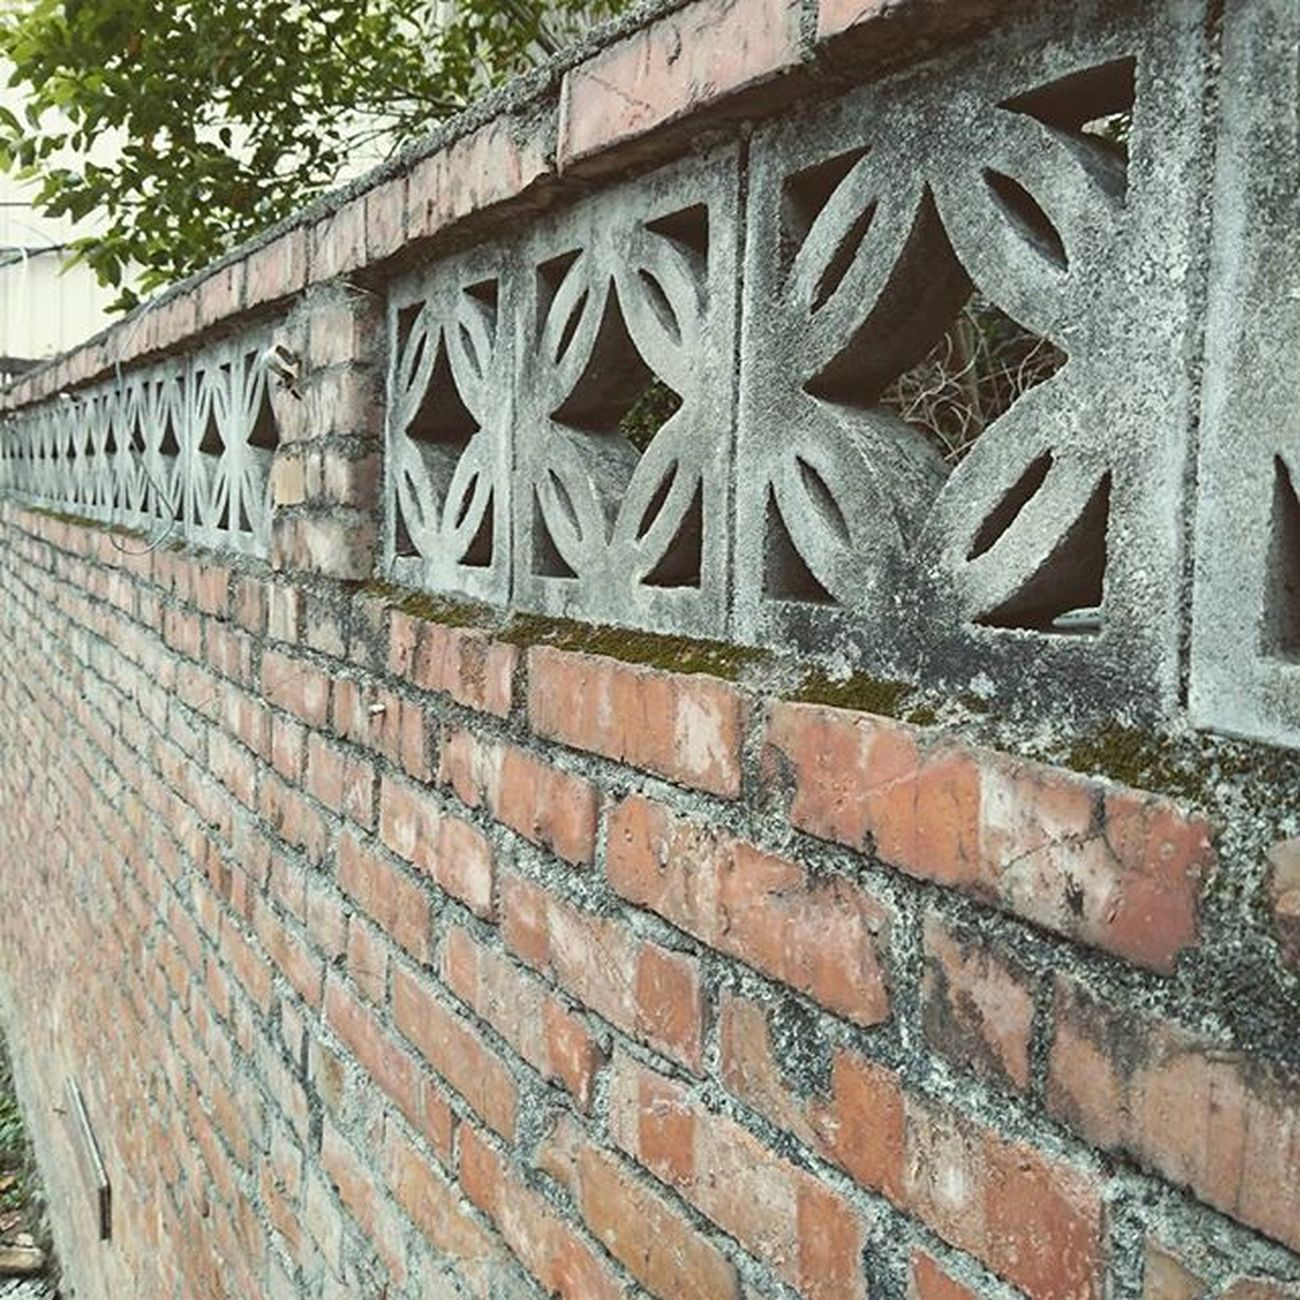 Wall Brick Red Taiwan Shinchu 紅磚 牆 . 水泥花磚 Photograph 美麗的舊紅磚牆。